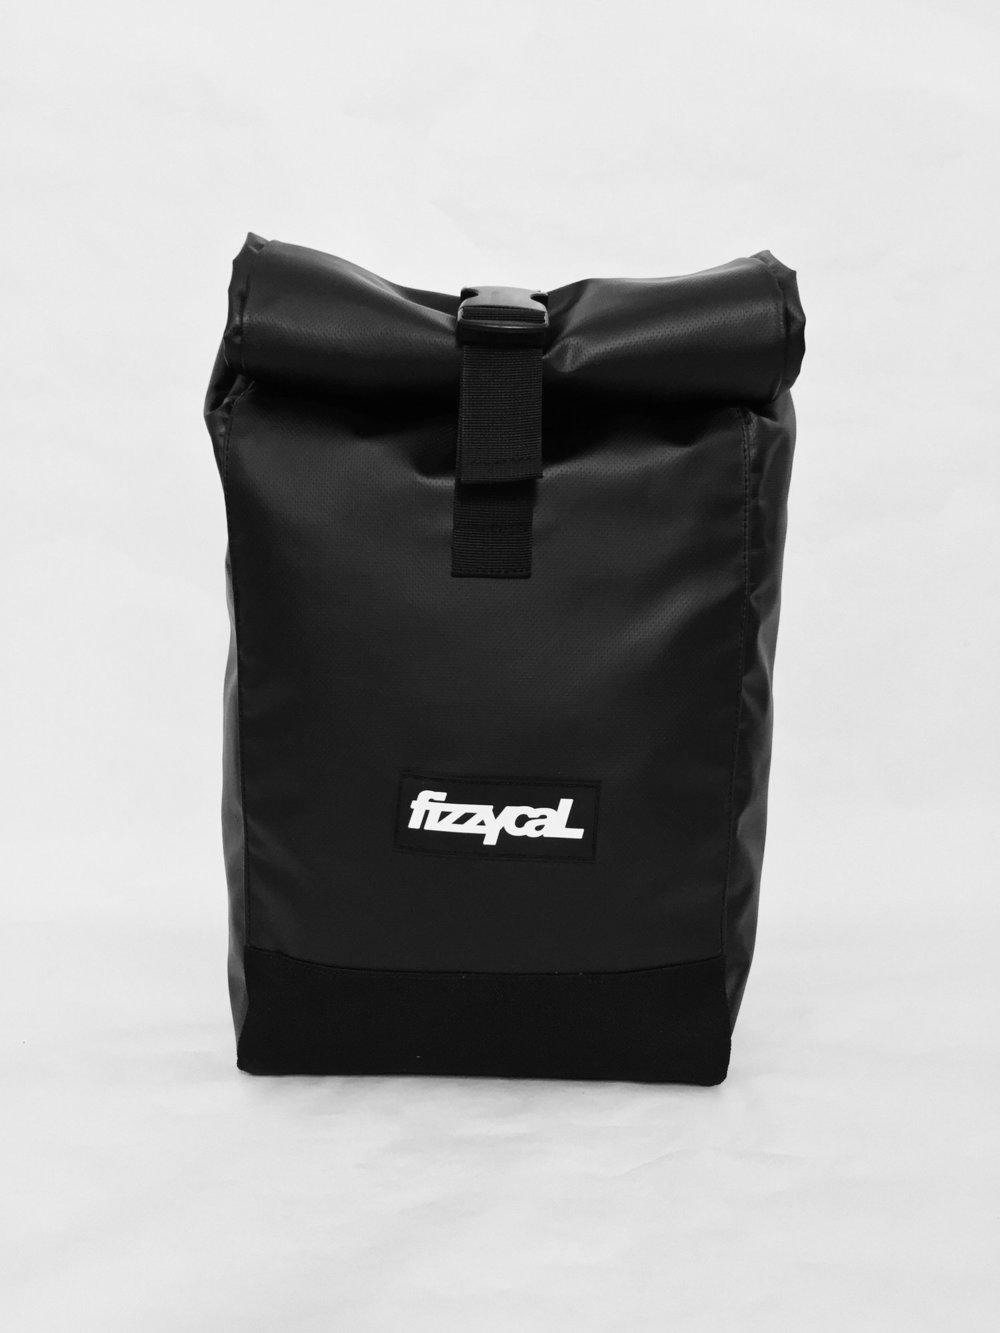 fizzYcaL_bag_squarespace-3.jpg